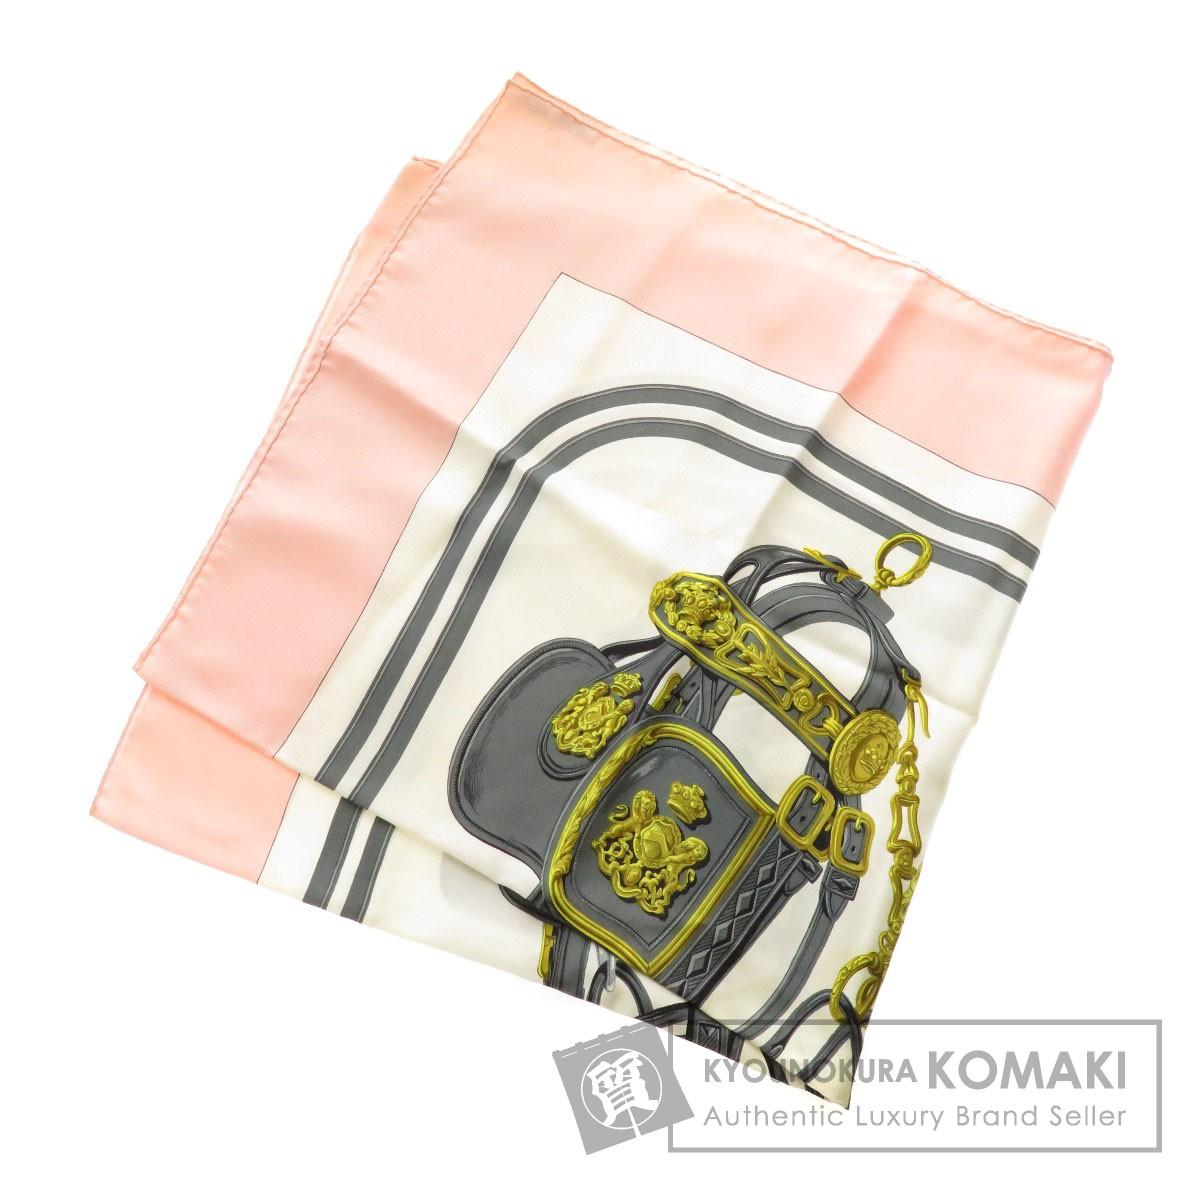 HERMES カレ90 BRIDES de GALA スカーフ シルク レディース 【中古】【エルメス】